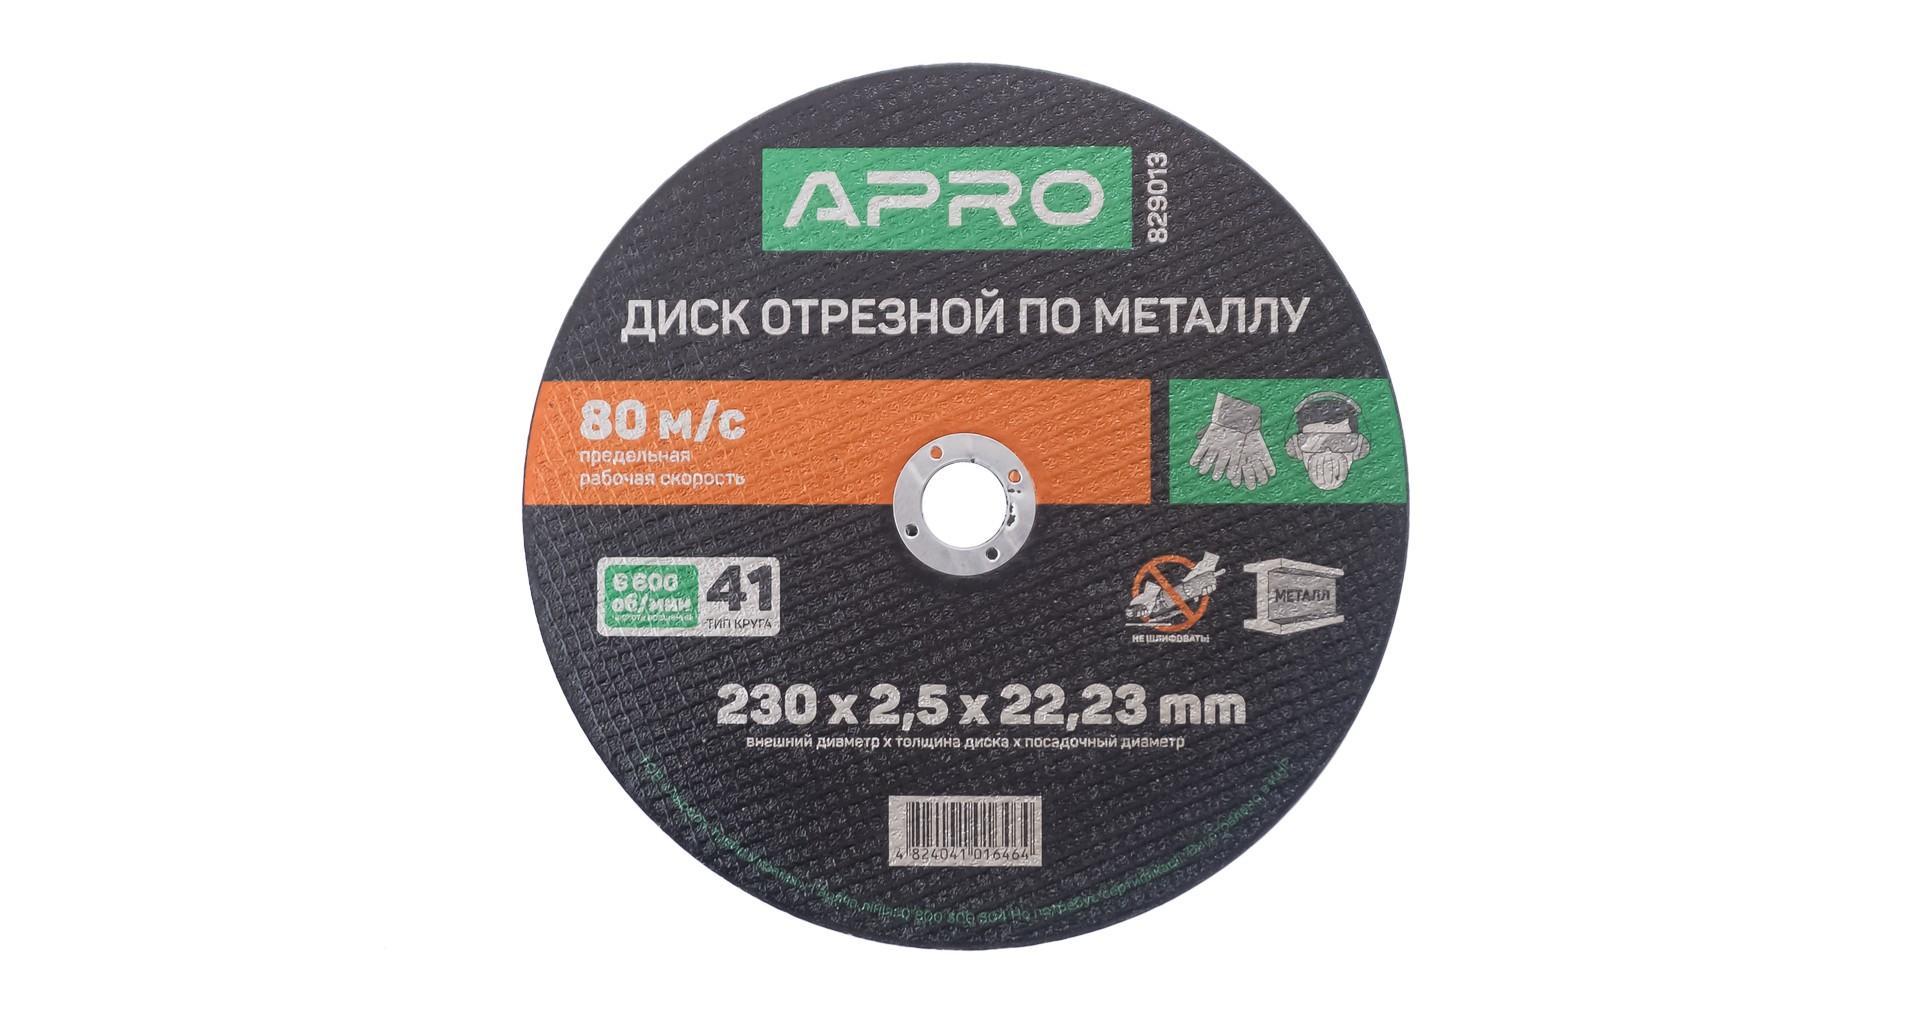 Диск отрезной по металлу Apro - 230 х 2,5 х 22,2 мм 3